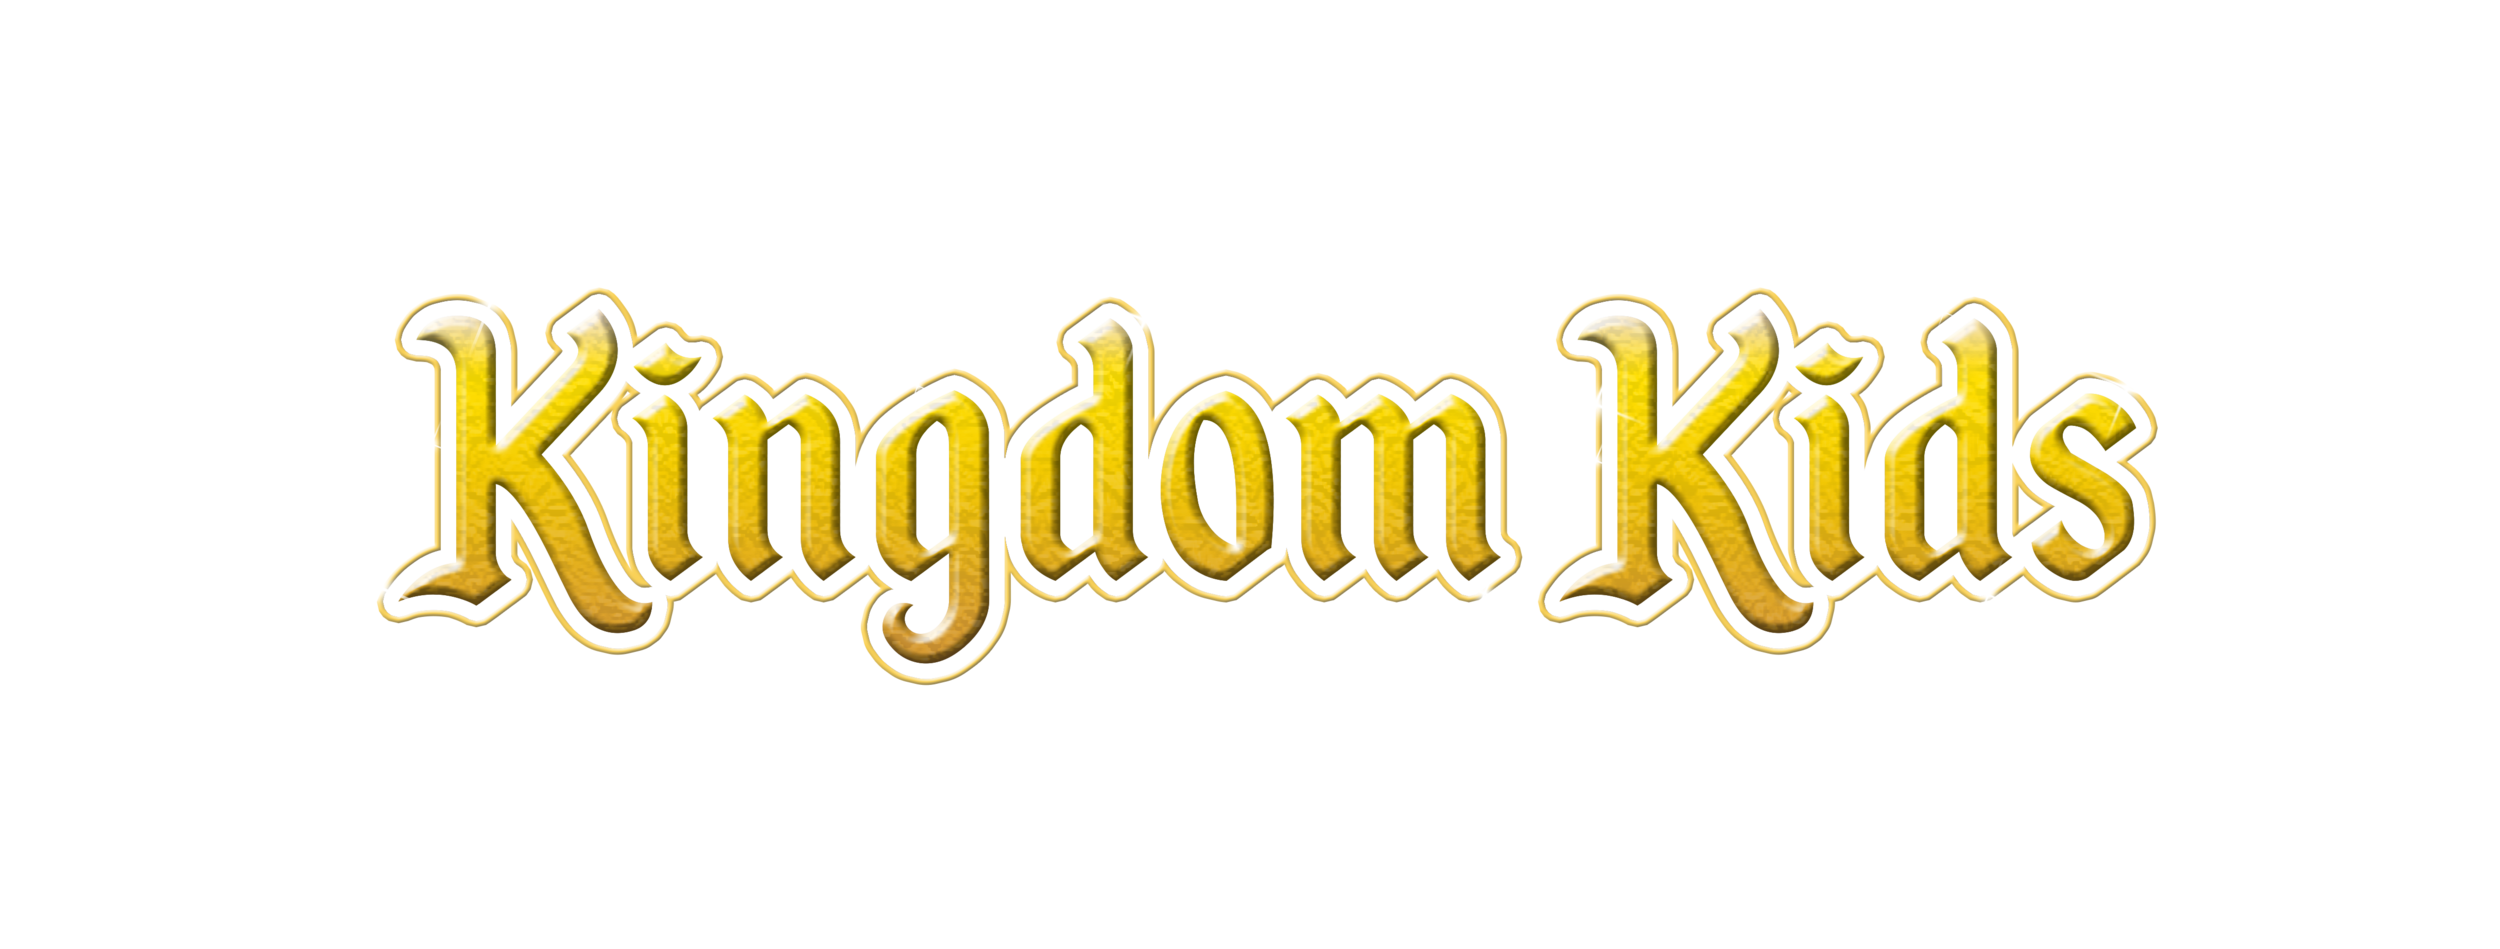 Kingdom Kids - Text Logo Gold Detail.png